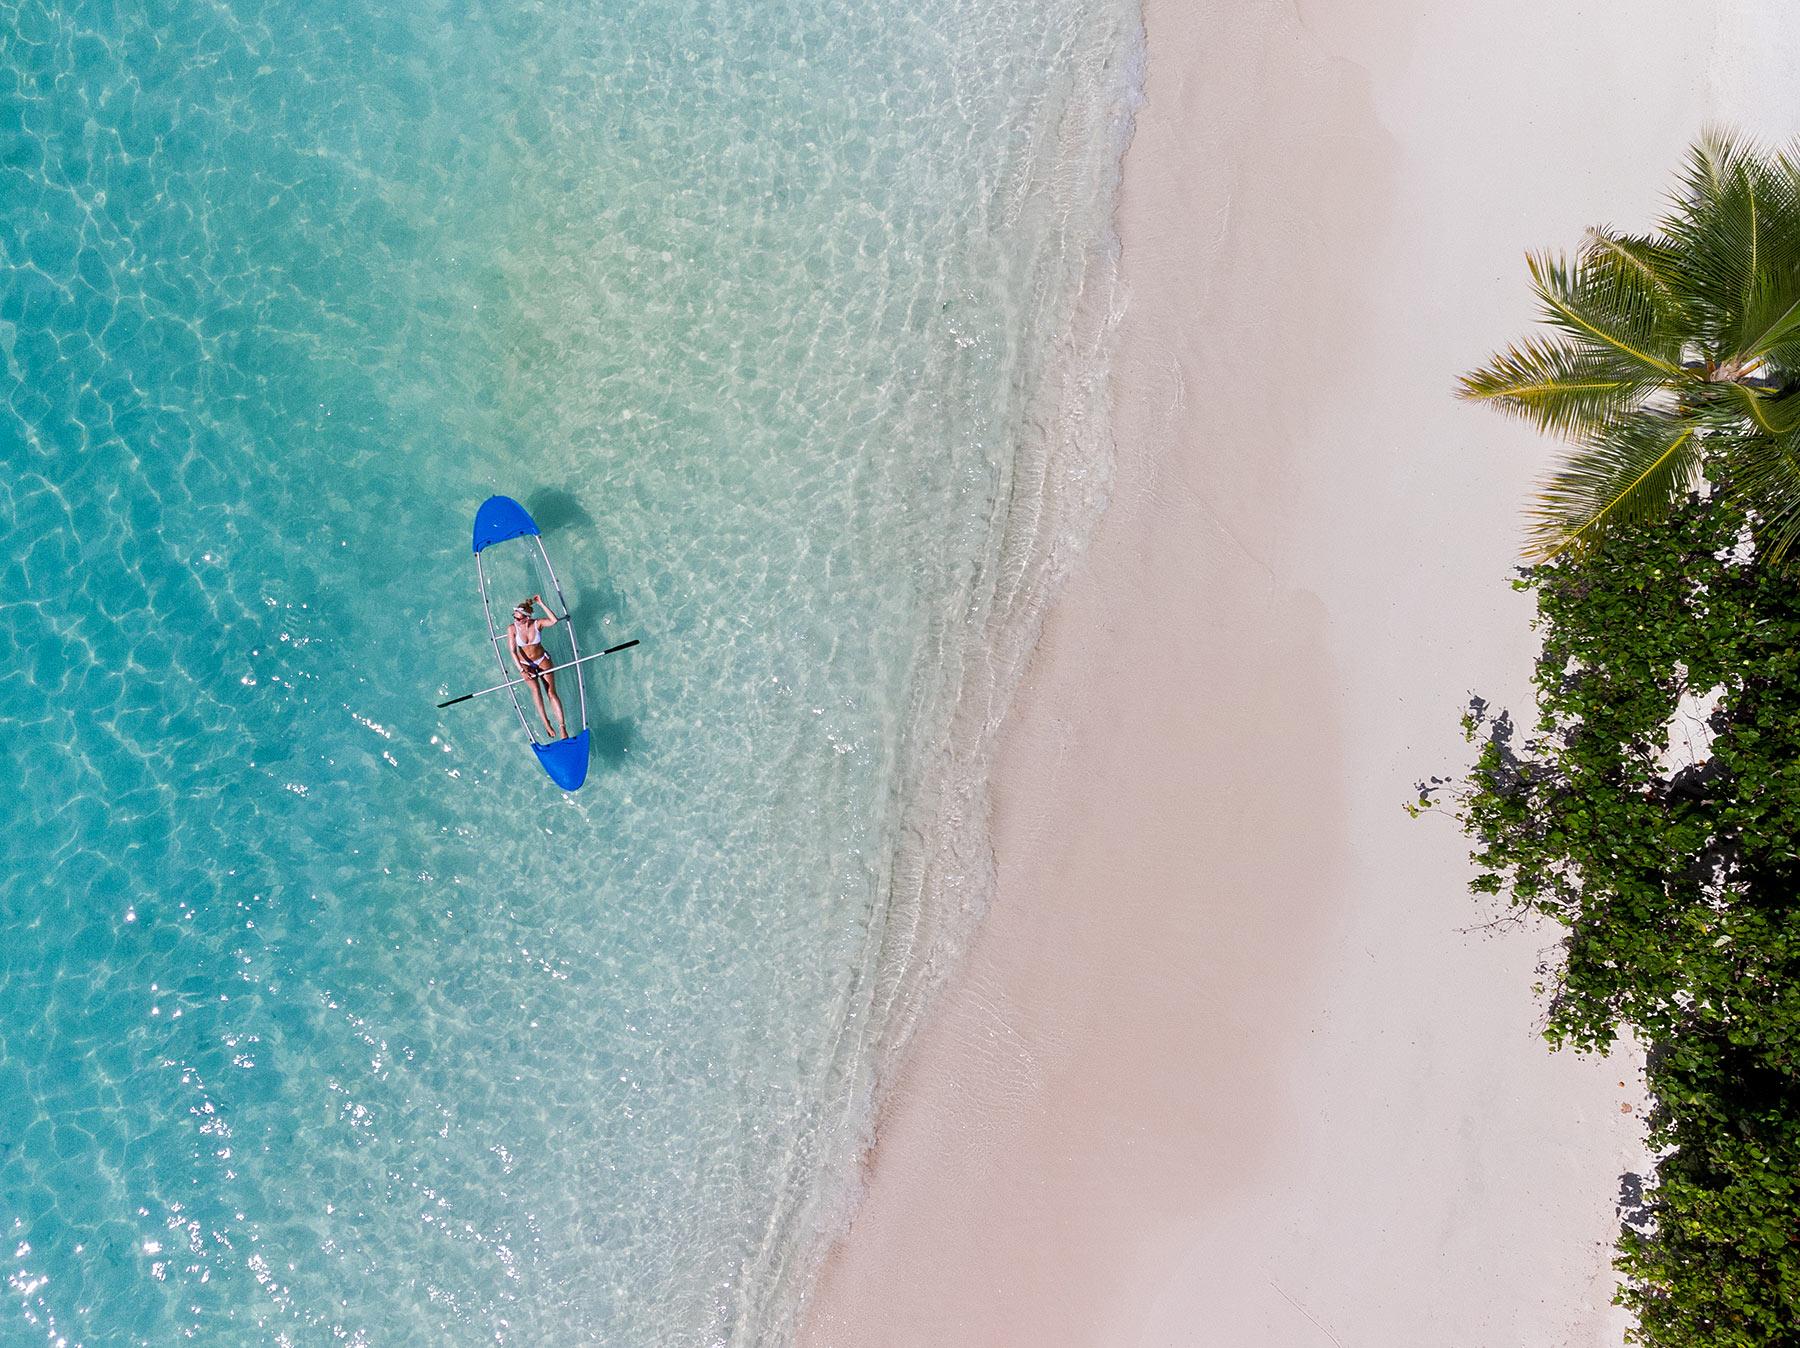 glasboden kajak malediven dhigali travel blog sunnyinga